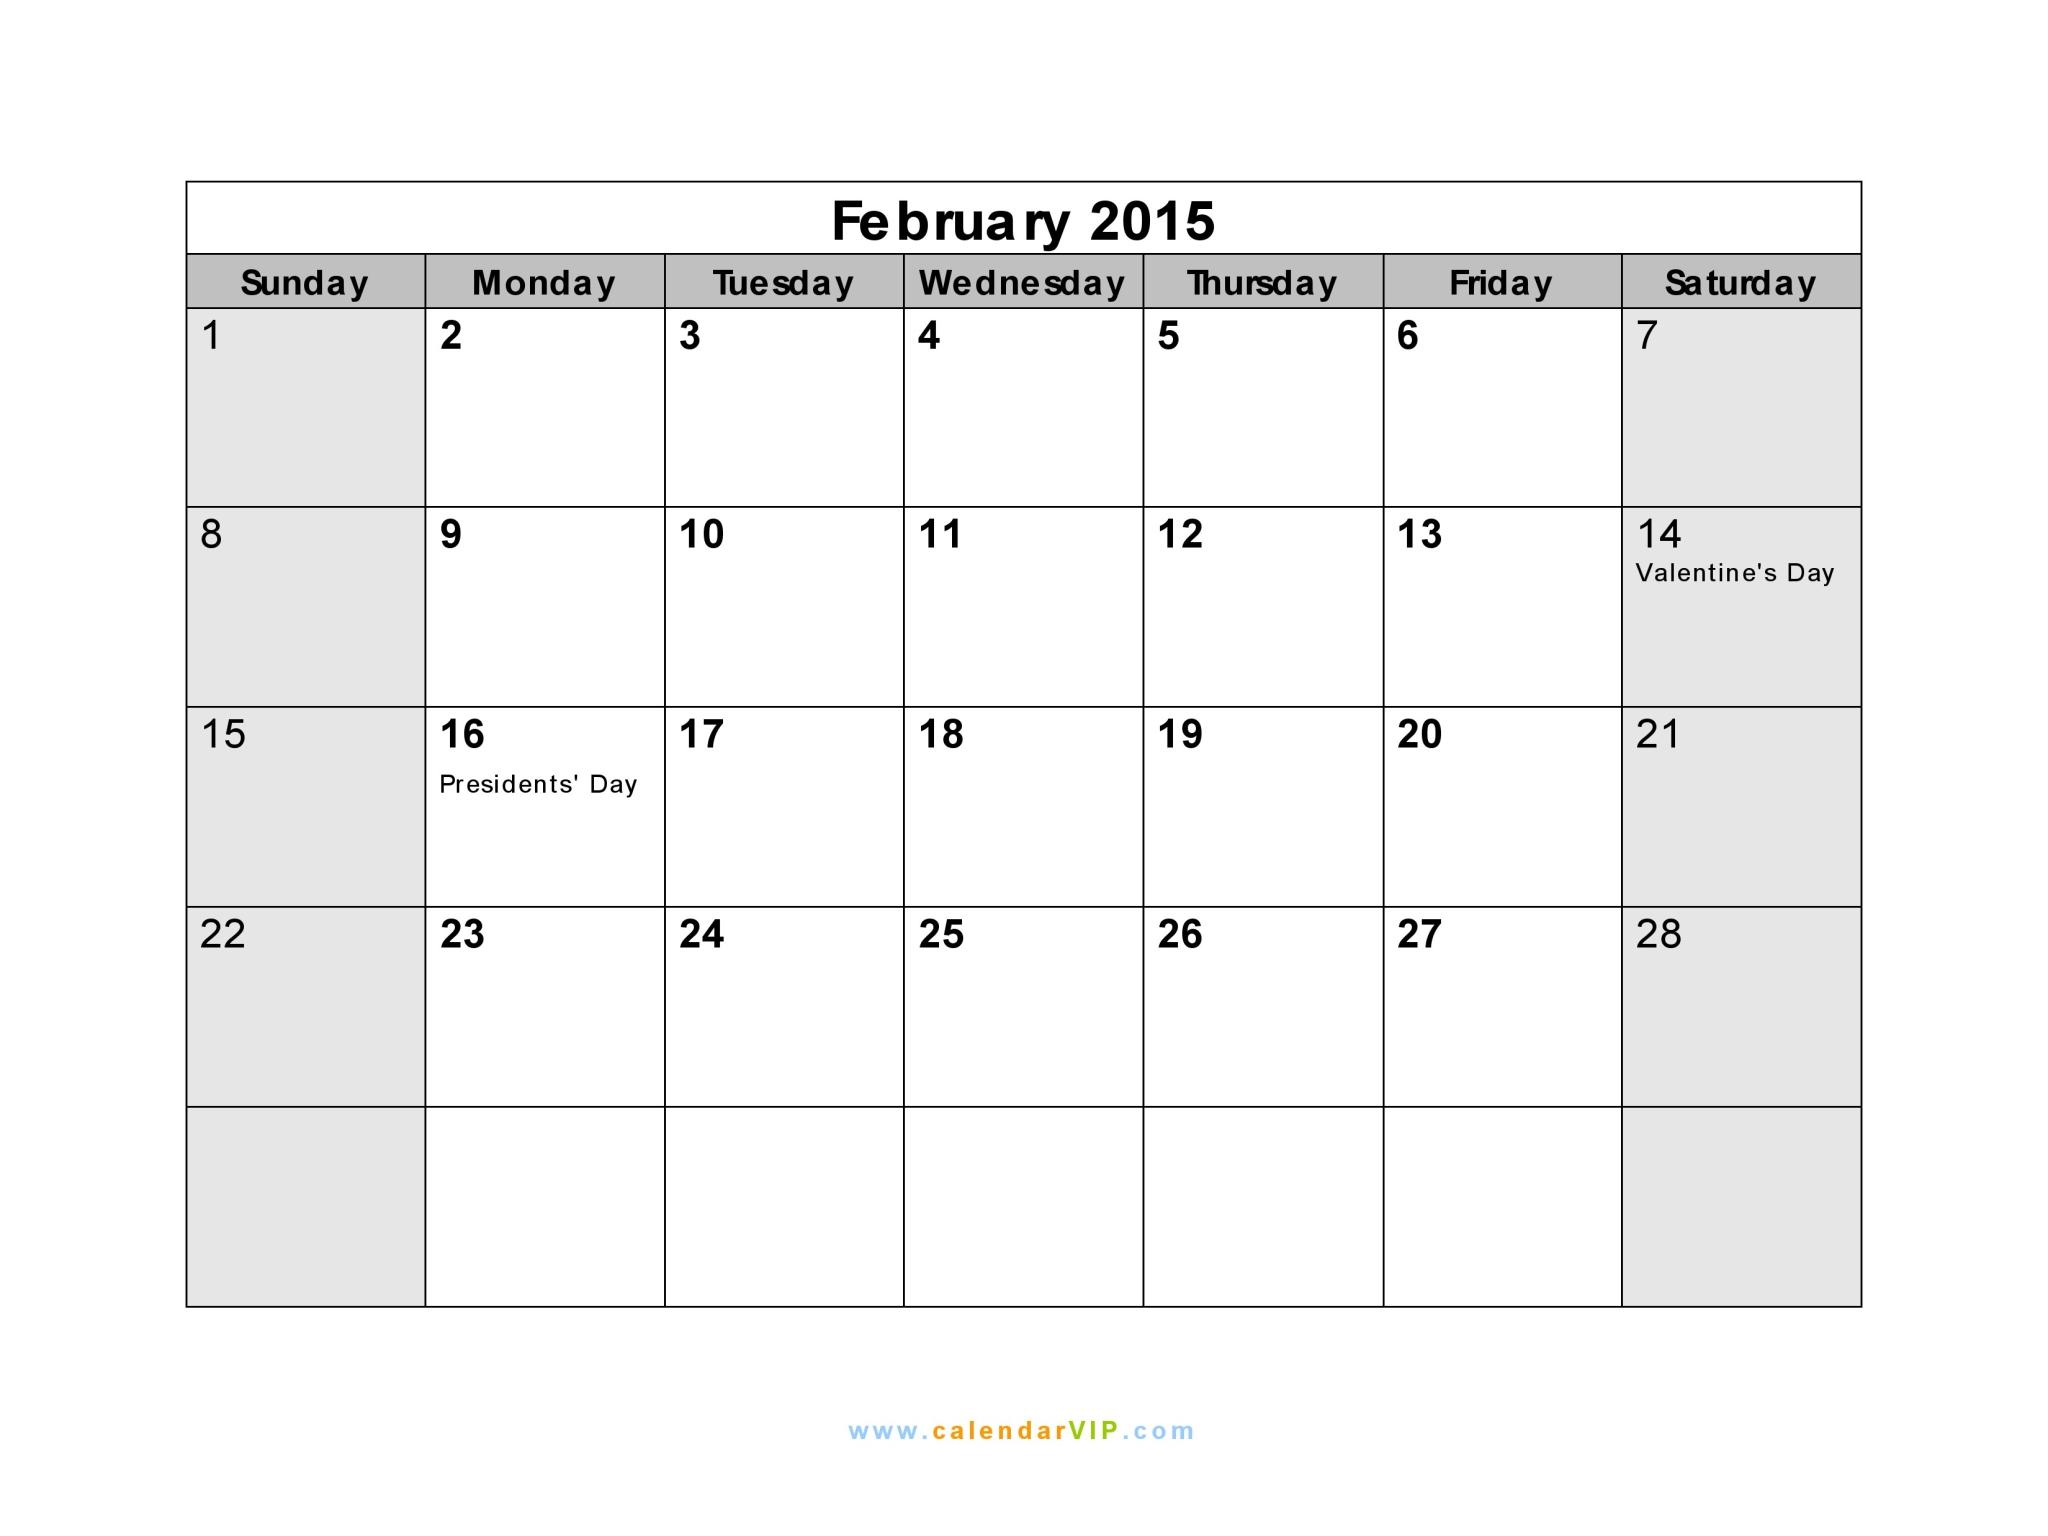 February 2015 Calendar Blank Printable Calendar Template In Pdf